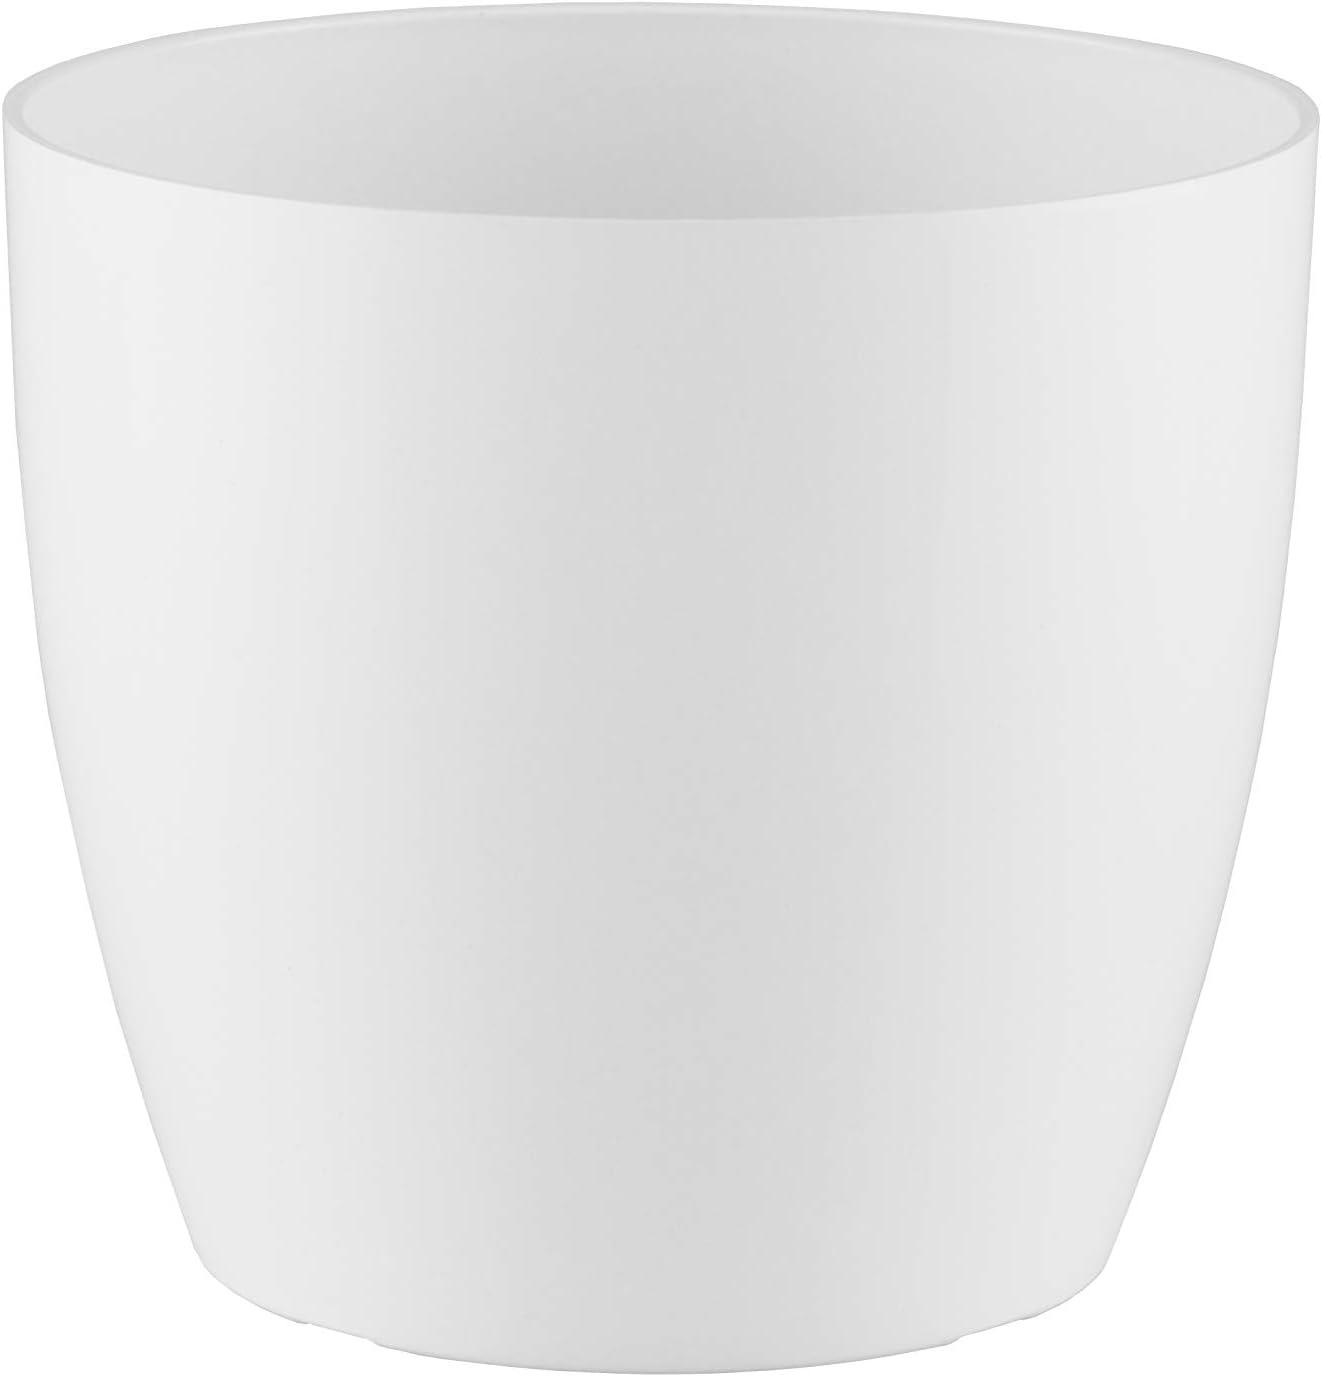 Artevasi 5600442806915 San Remo Pot 18 cm White White